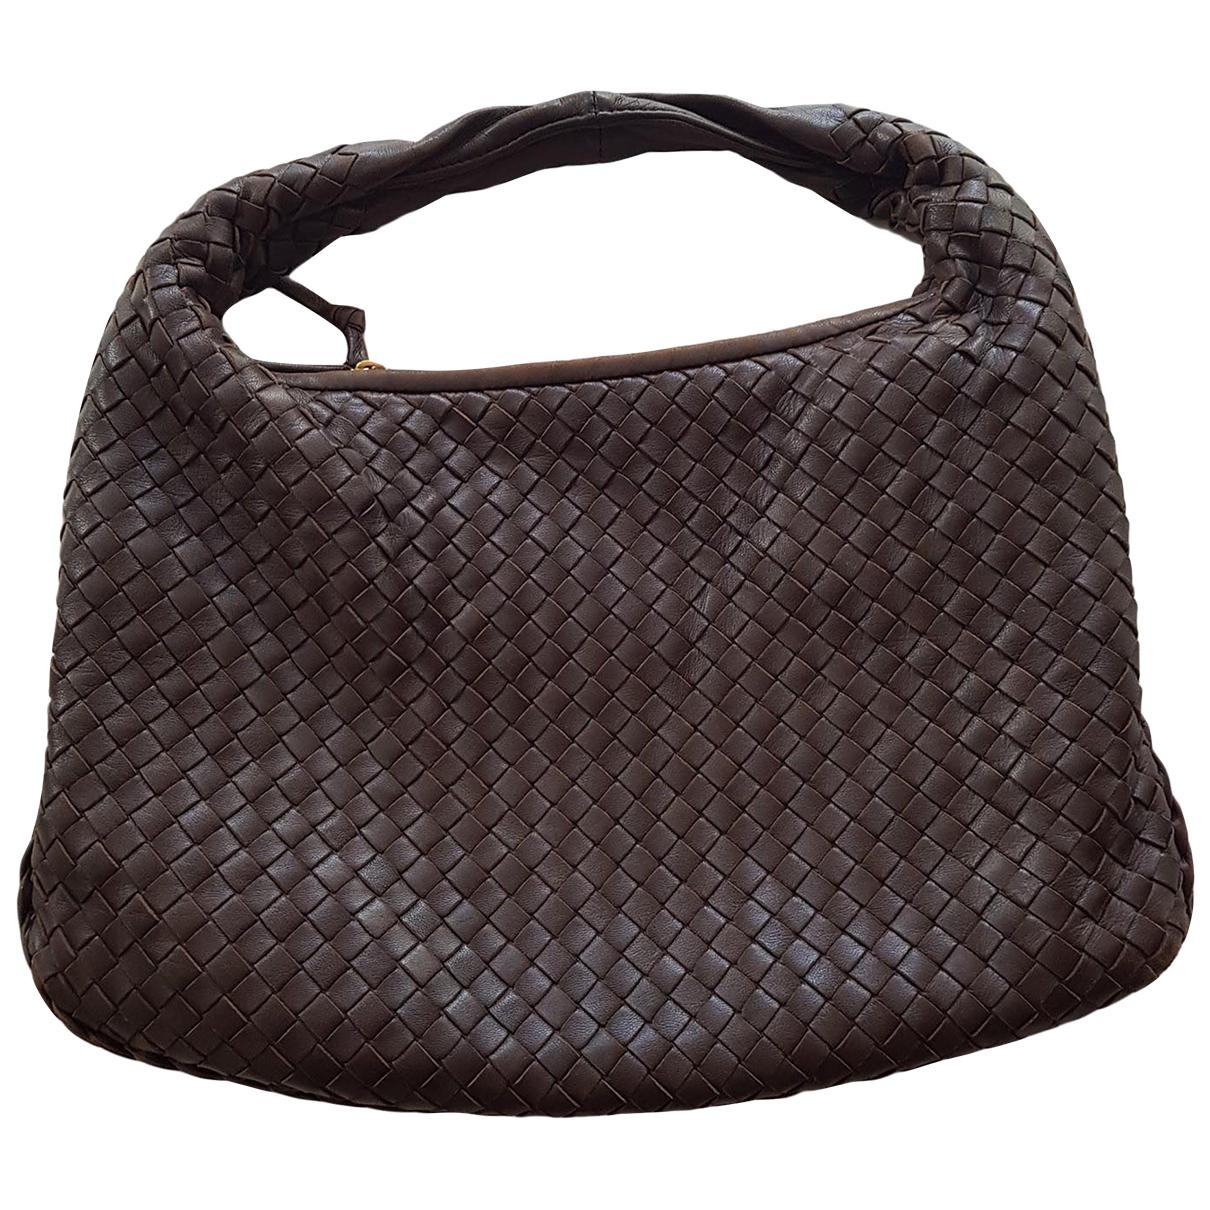 Bottega Veneta Veneta Brown Leather handbag for Women \N